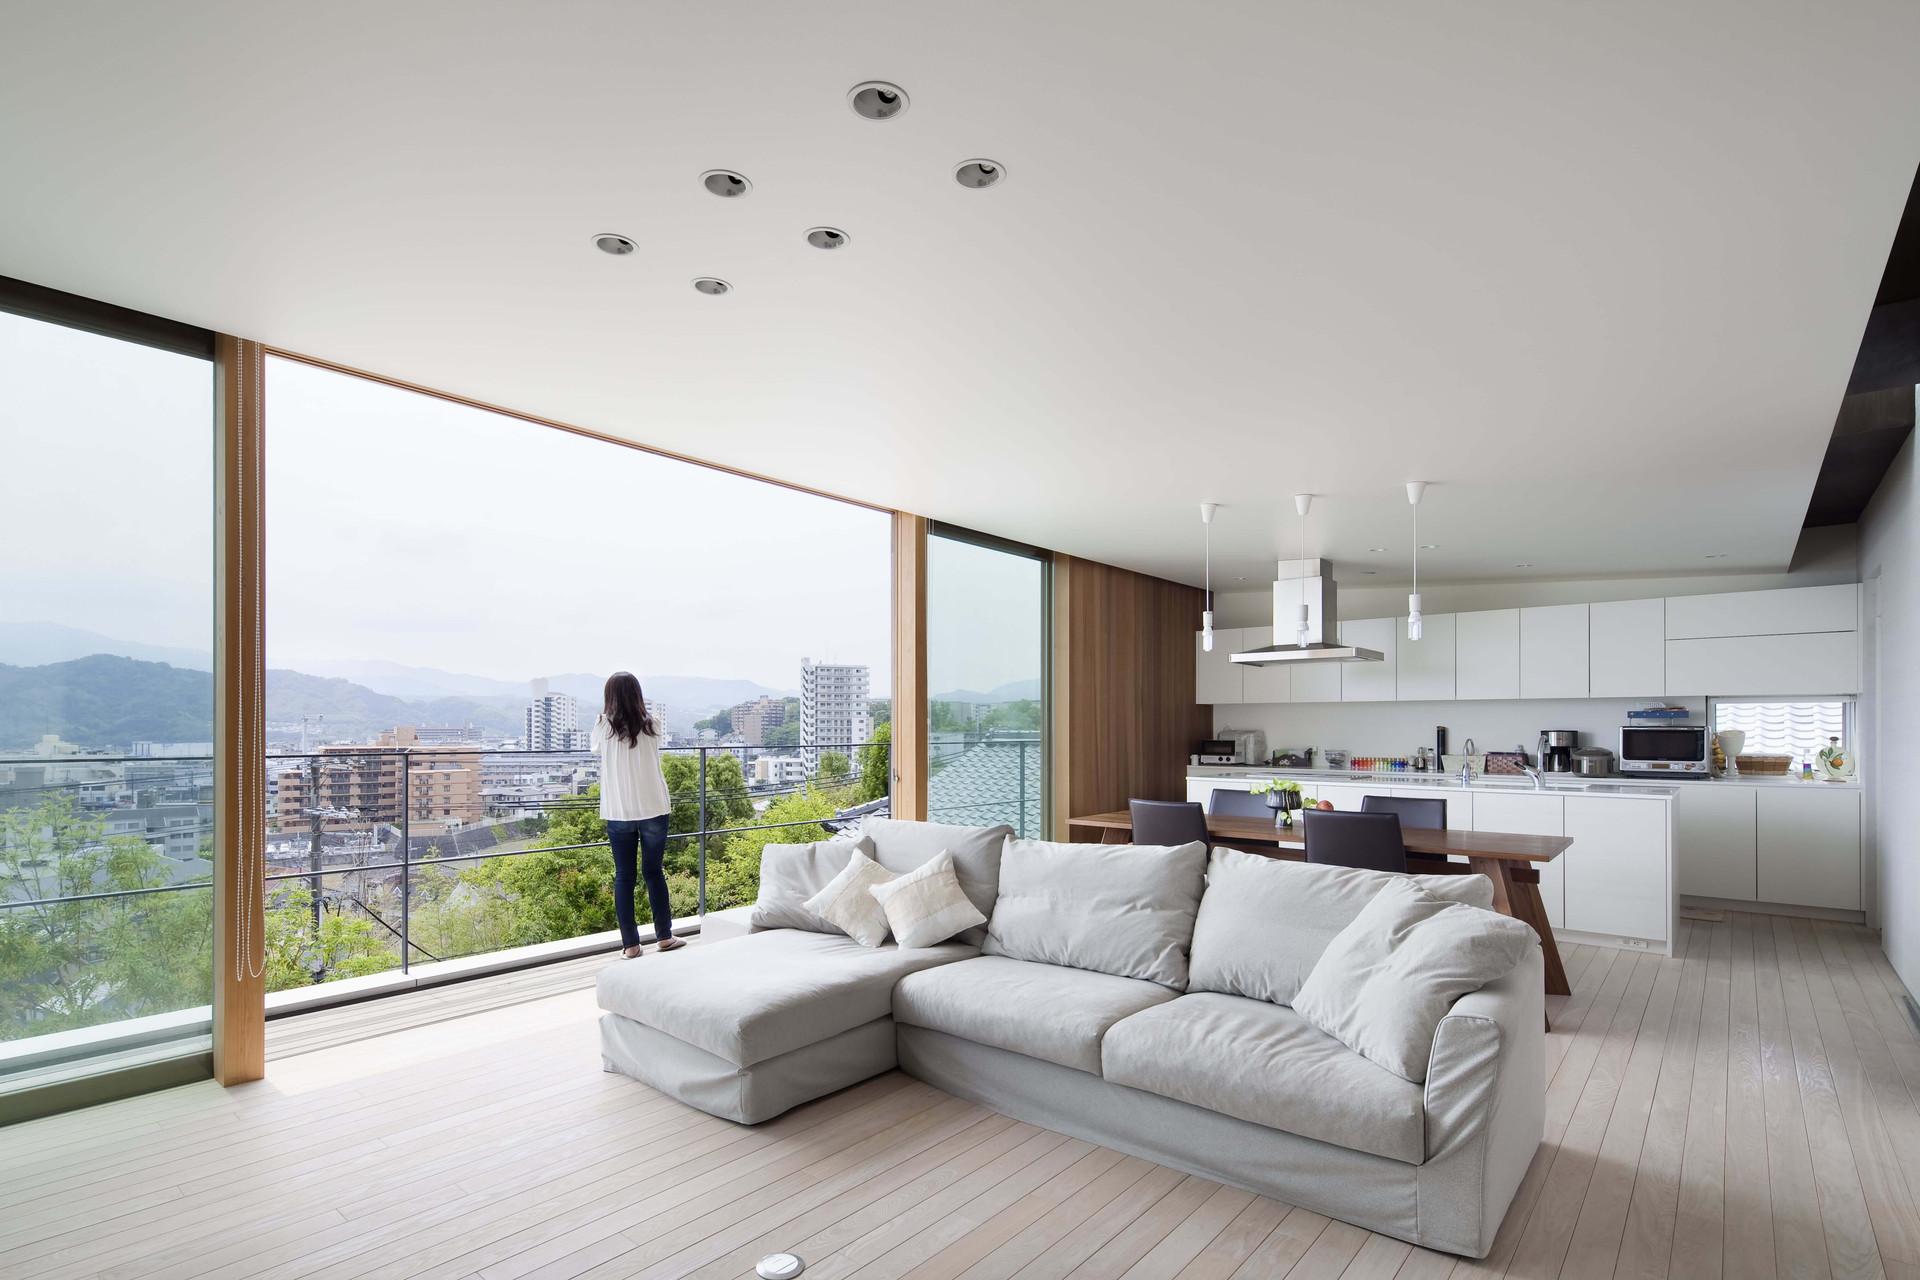 architect-office-hill-house-2400_03.jpg